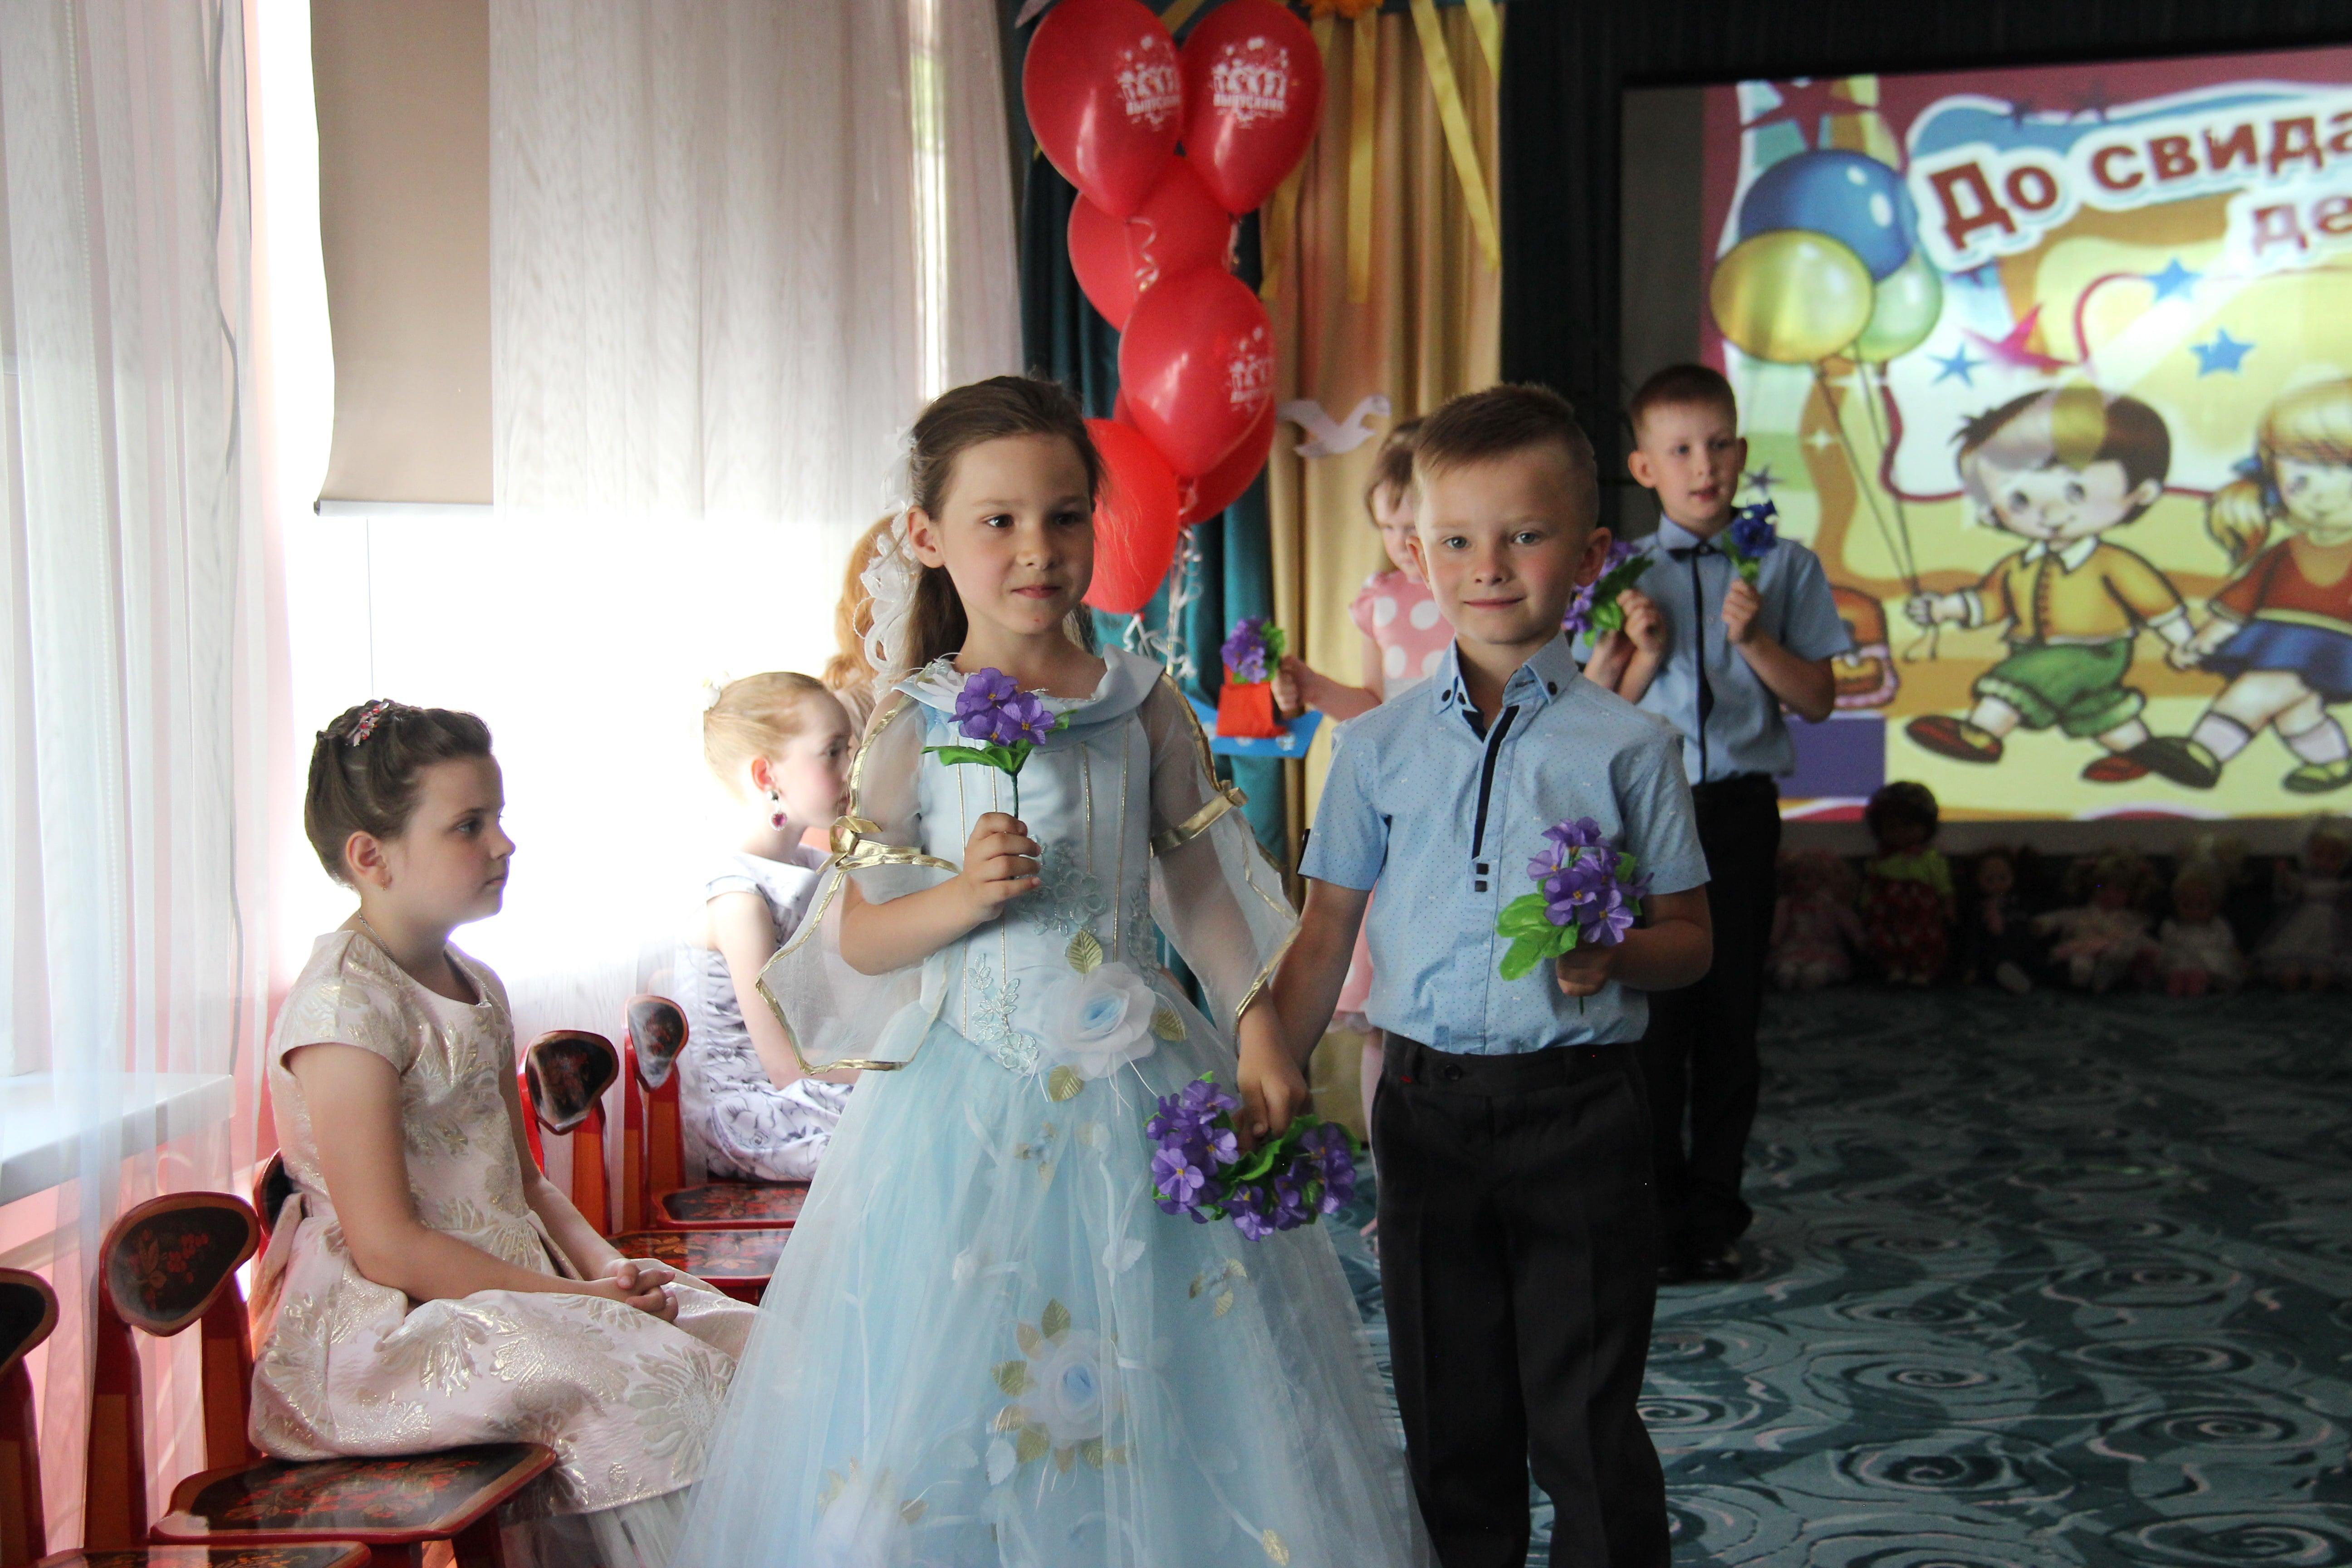 http://monuspen.ru/photoreports/7fed91ab43eb34a6339ce71d7ad97113.JPG